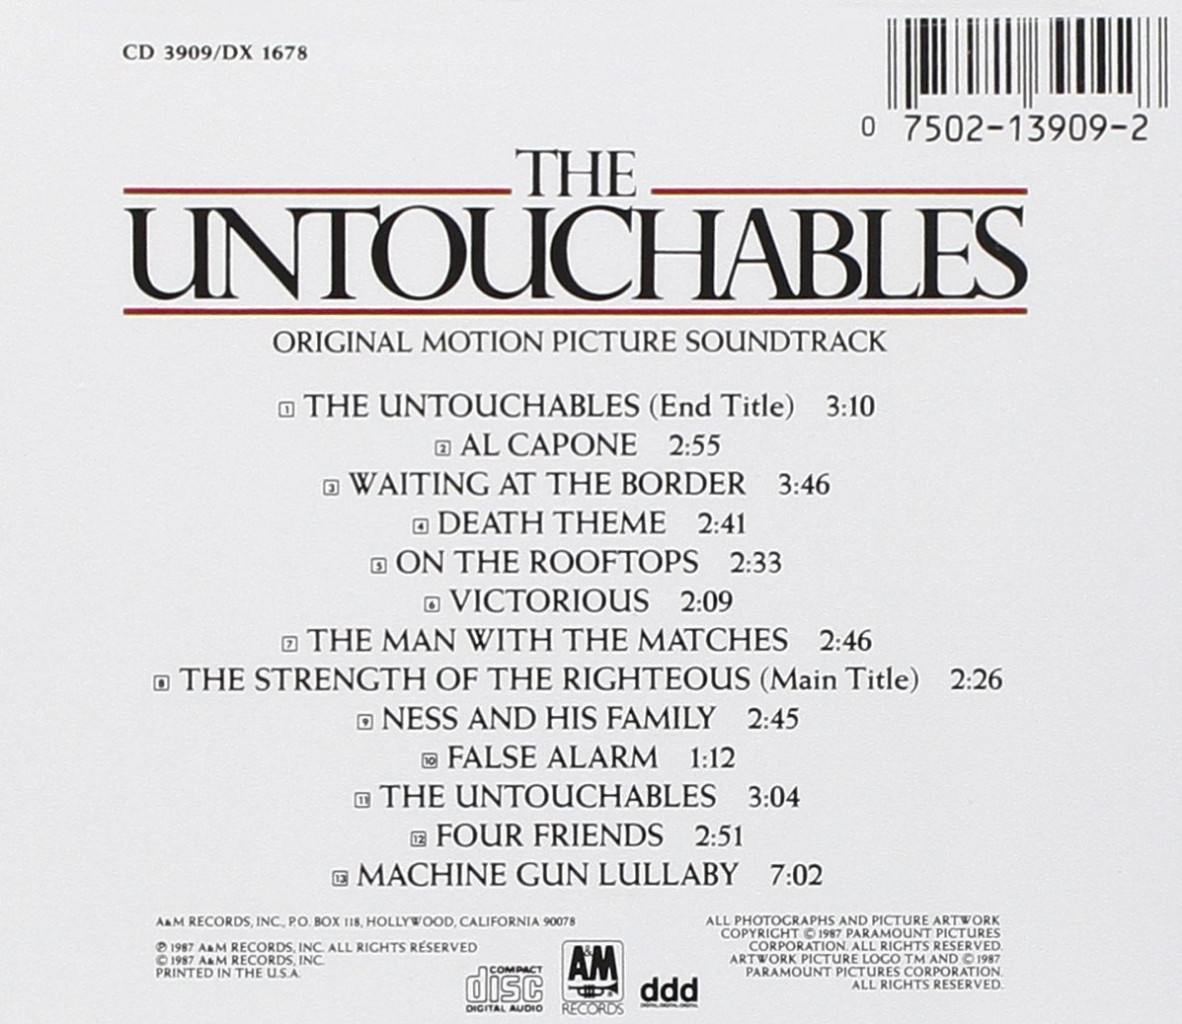 Image 1 of The Untouchables (1987 Film)